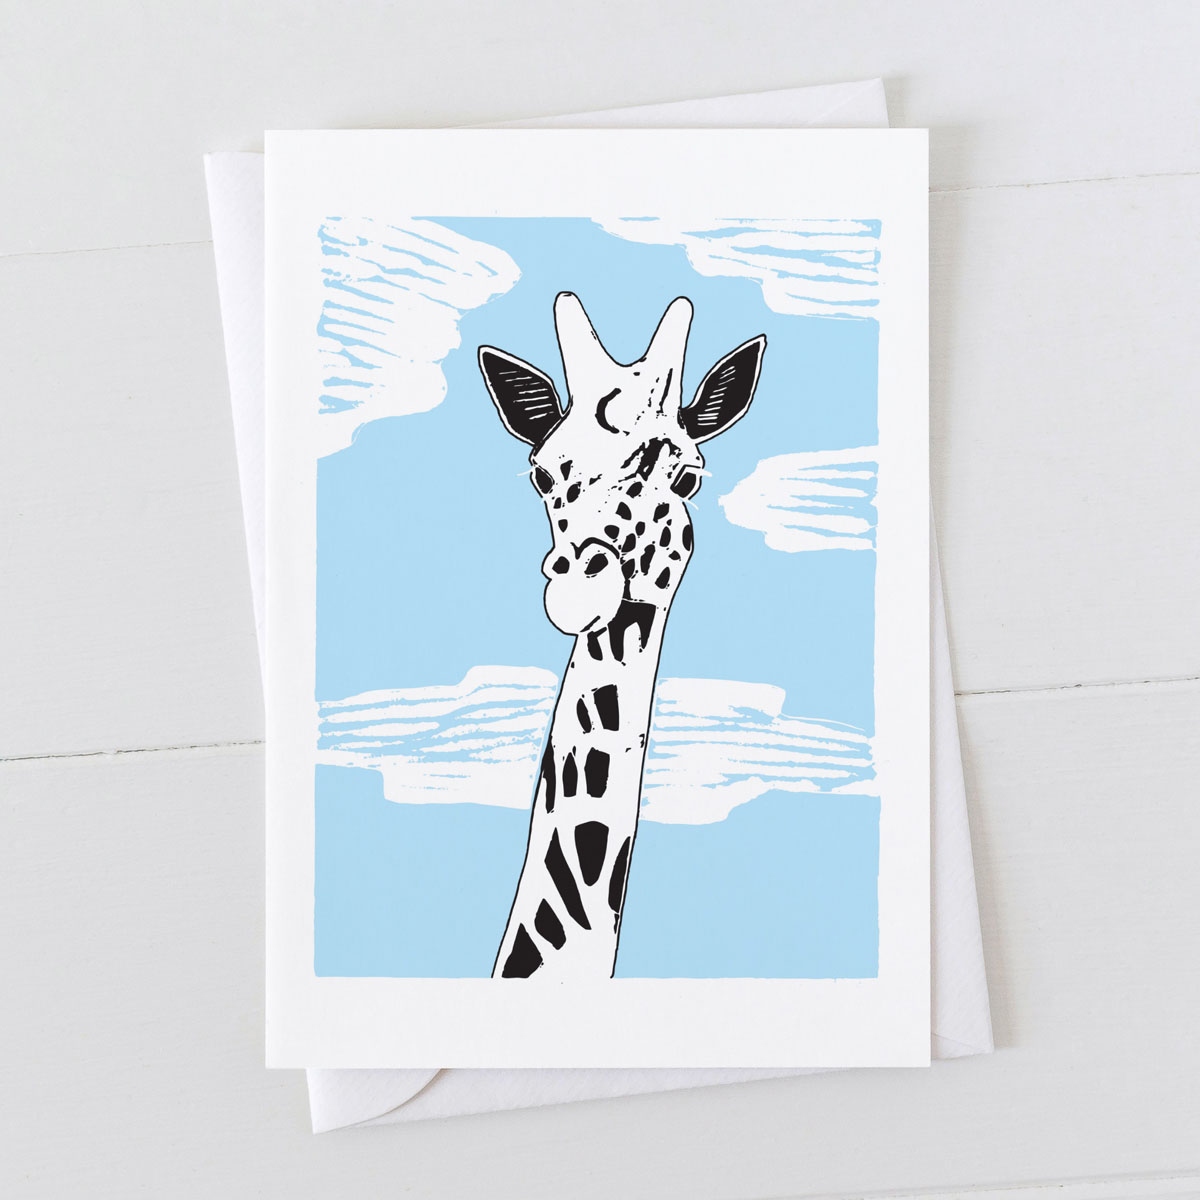 Giraffe Colour Linocut Greeting Card